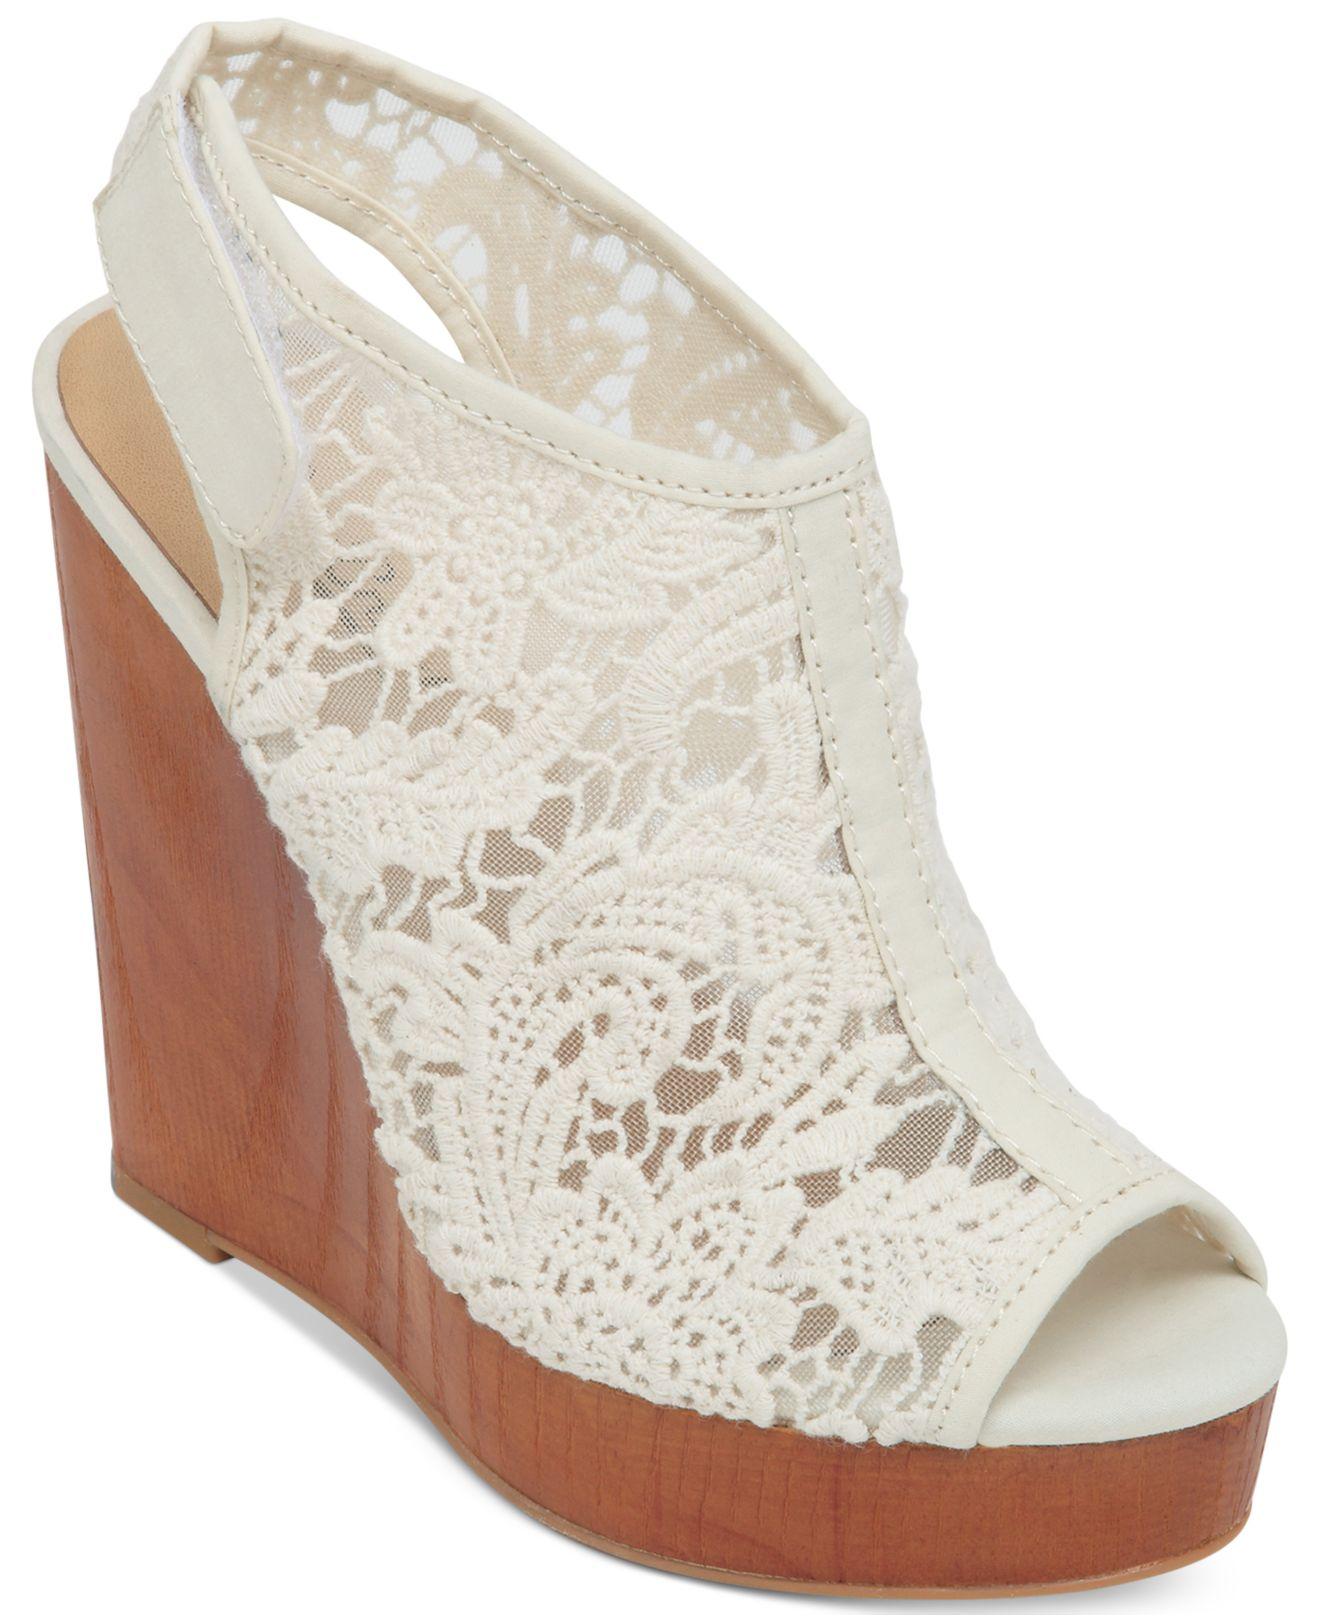 ca6940d15fc Lyst - Lucky Brand Women s Rezdah2 Crochet Platform Wedge Sandals in ...